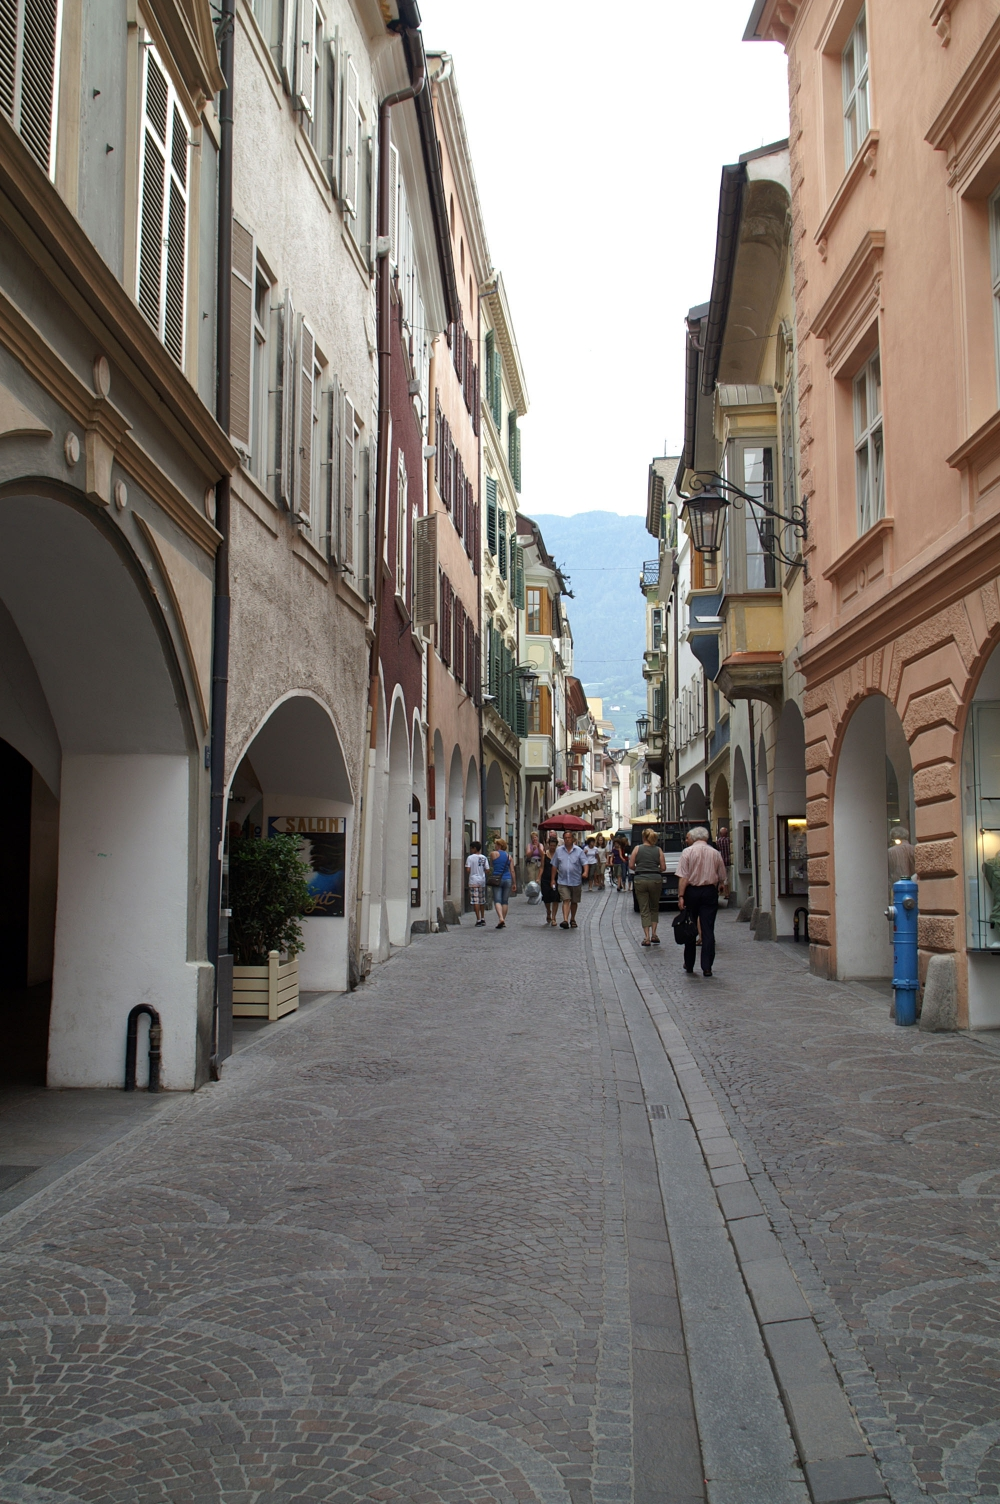 Offerta vacanza Vacanza breve - Sleep and Shop a Merano